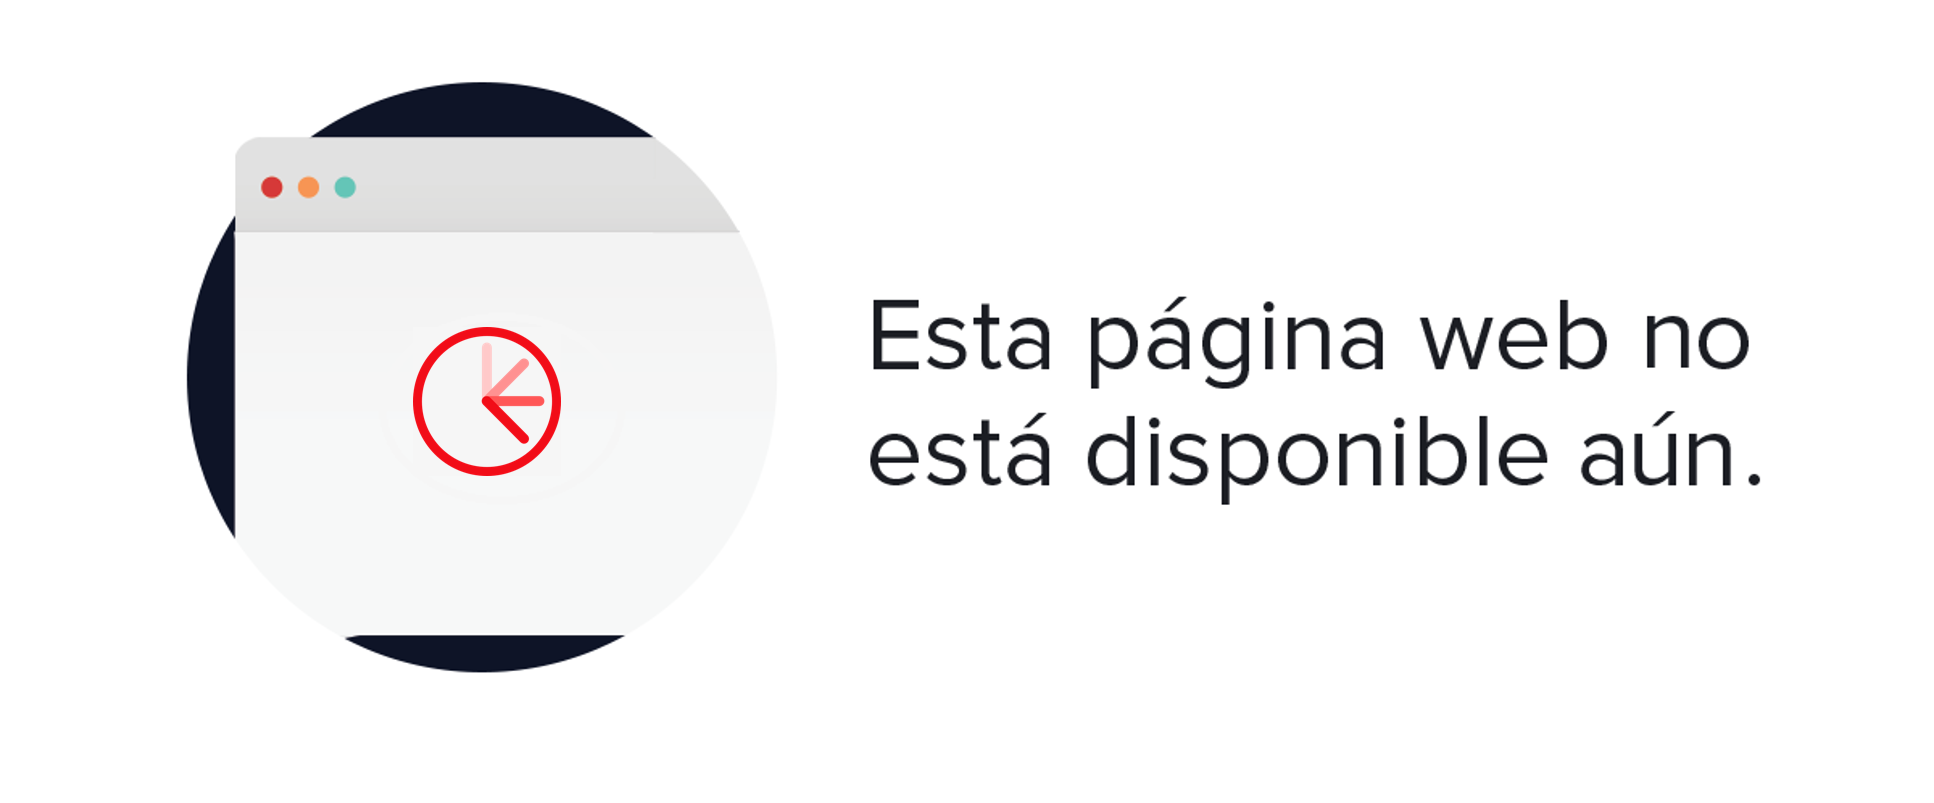 Jocavi - Pantalón pitillo de mujer Jocavi con cinco bolsillos Morado 001015760301026038 - QAJZVWZ